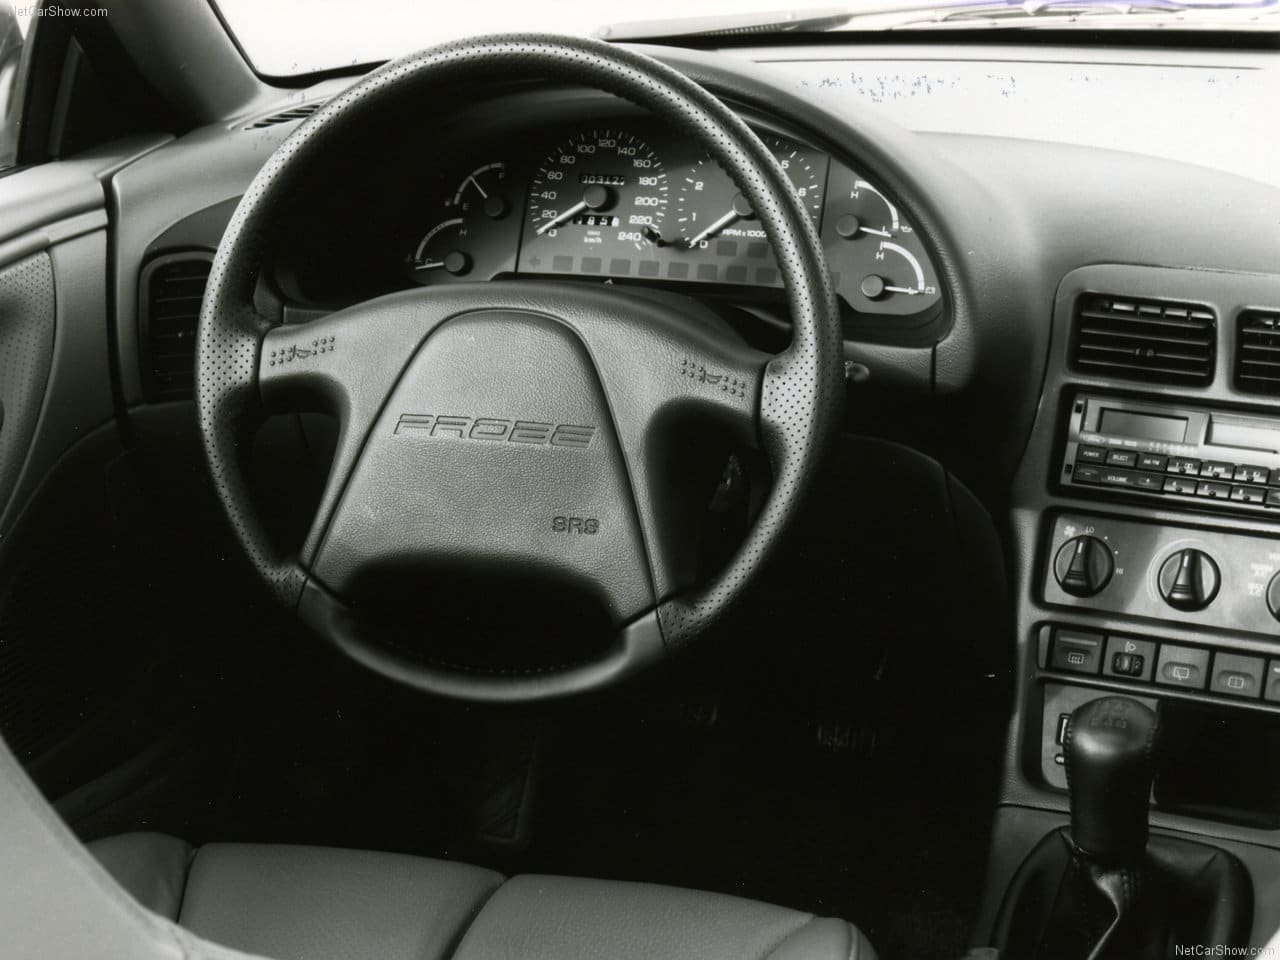 Ford, Ford Probe, Probe, Mazda, Mazda MX 6, MX 6, coupe, Capri, Ford Capri, v6, quad cam, quad cam v6, sports car, classic car, retro car, motoring, automotive, car, cars, ebay, ebay motors, autotrader, featured